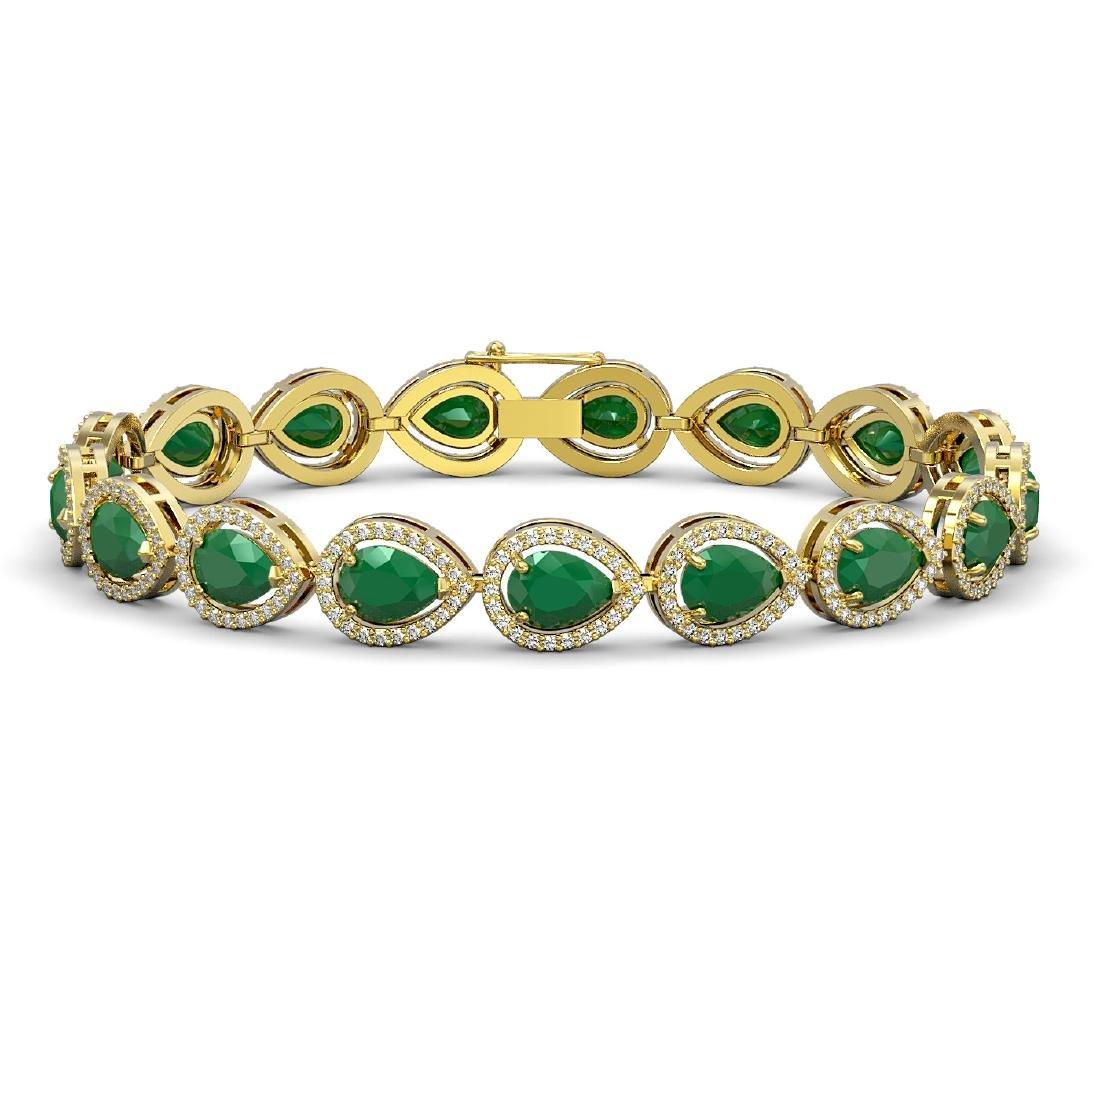 21.69 CTW Emerald & Diamond Halo Bracelet 10K Yellow